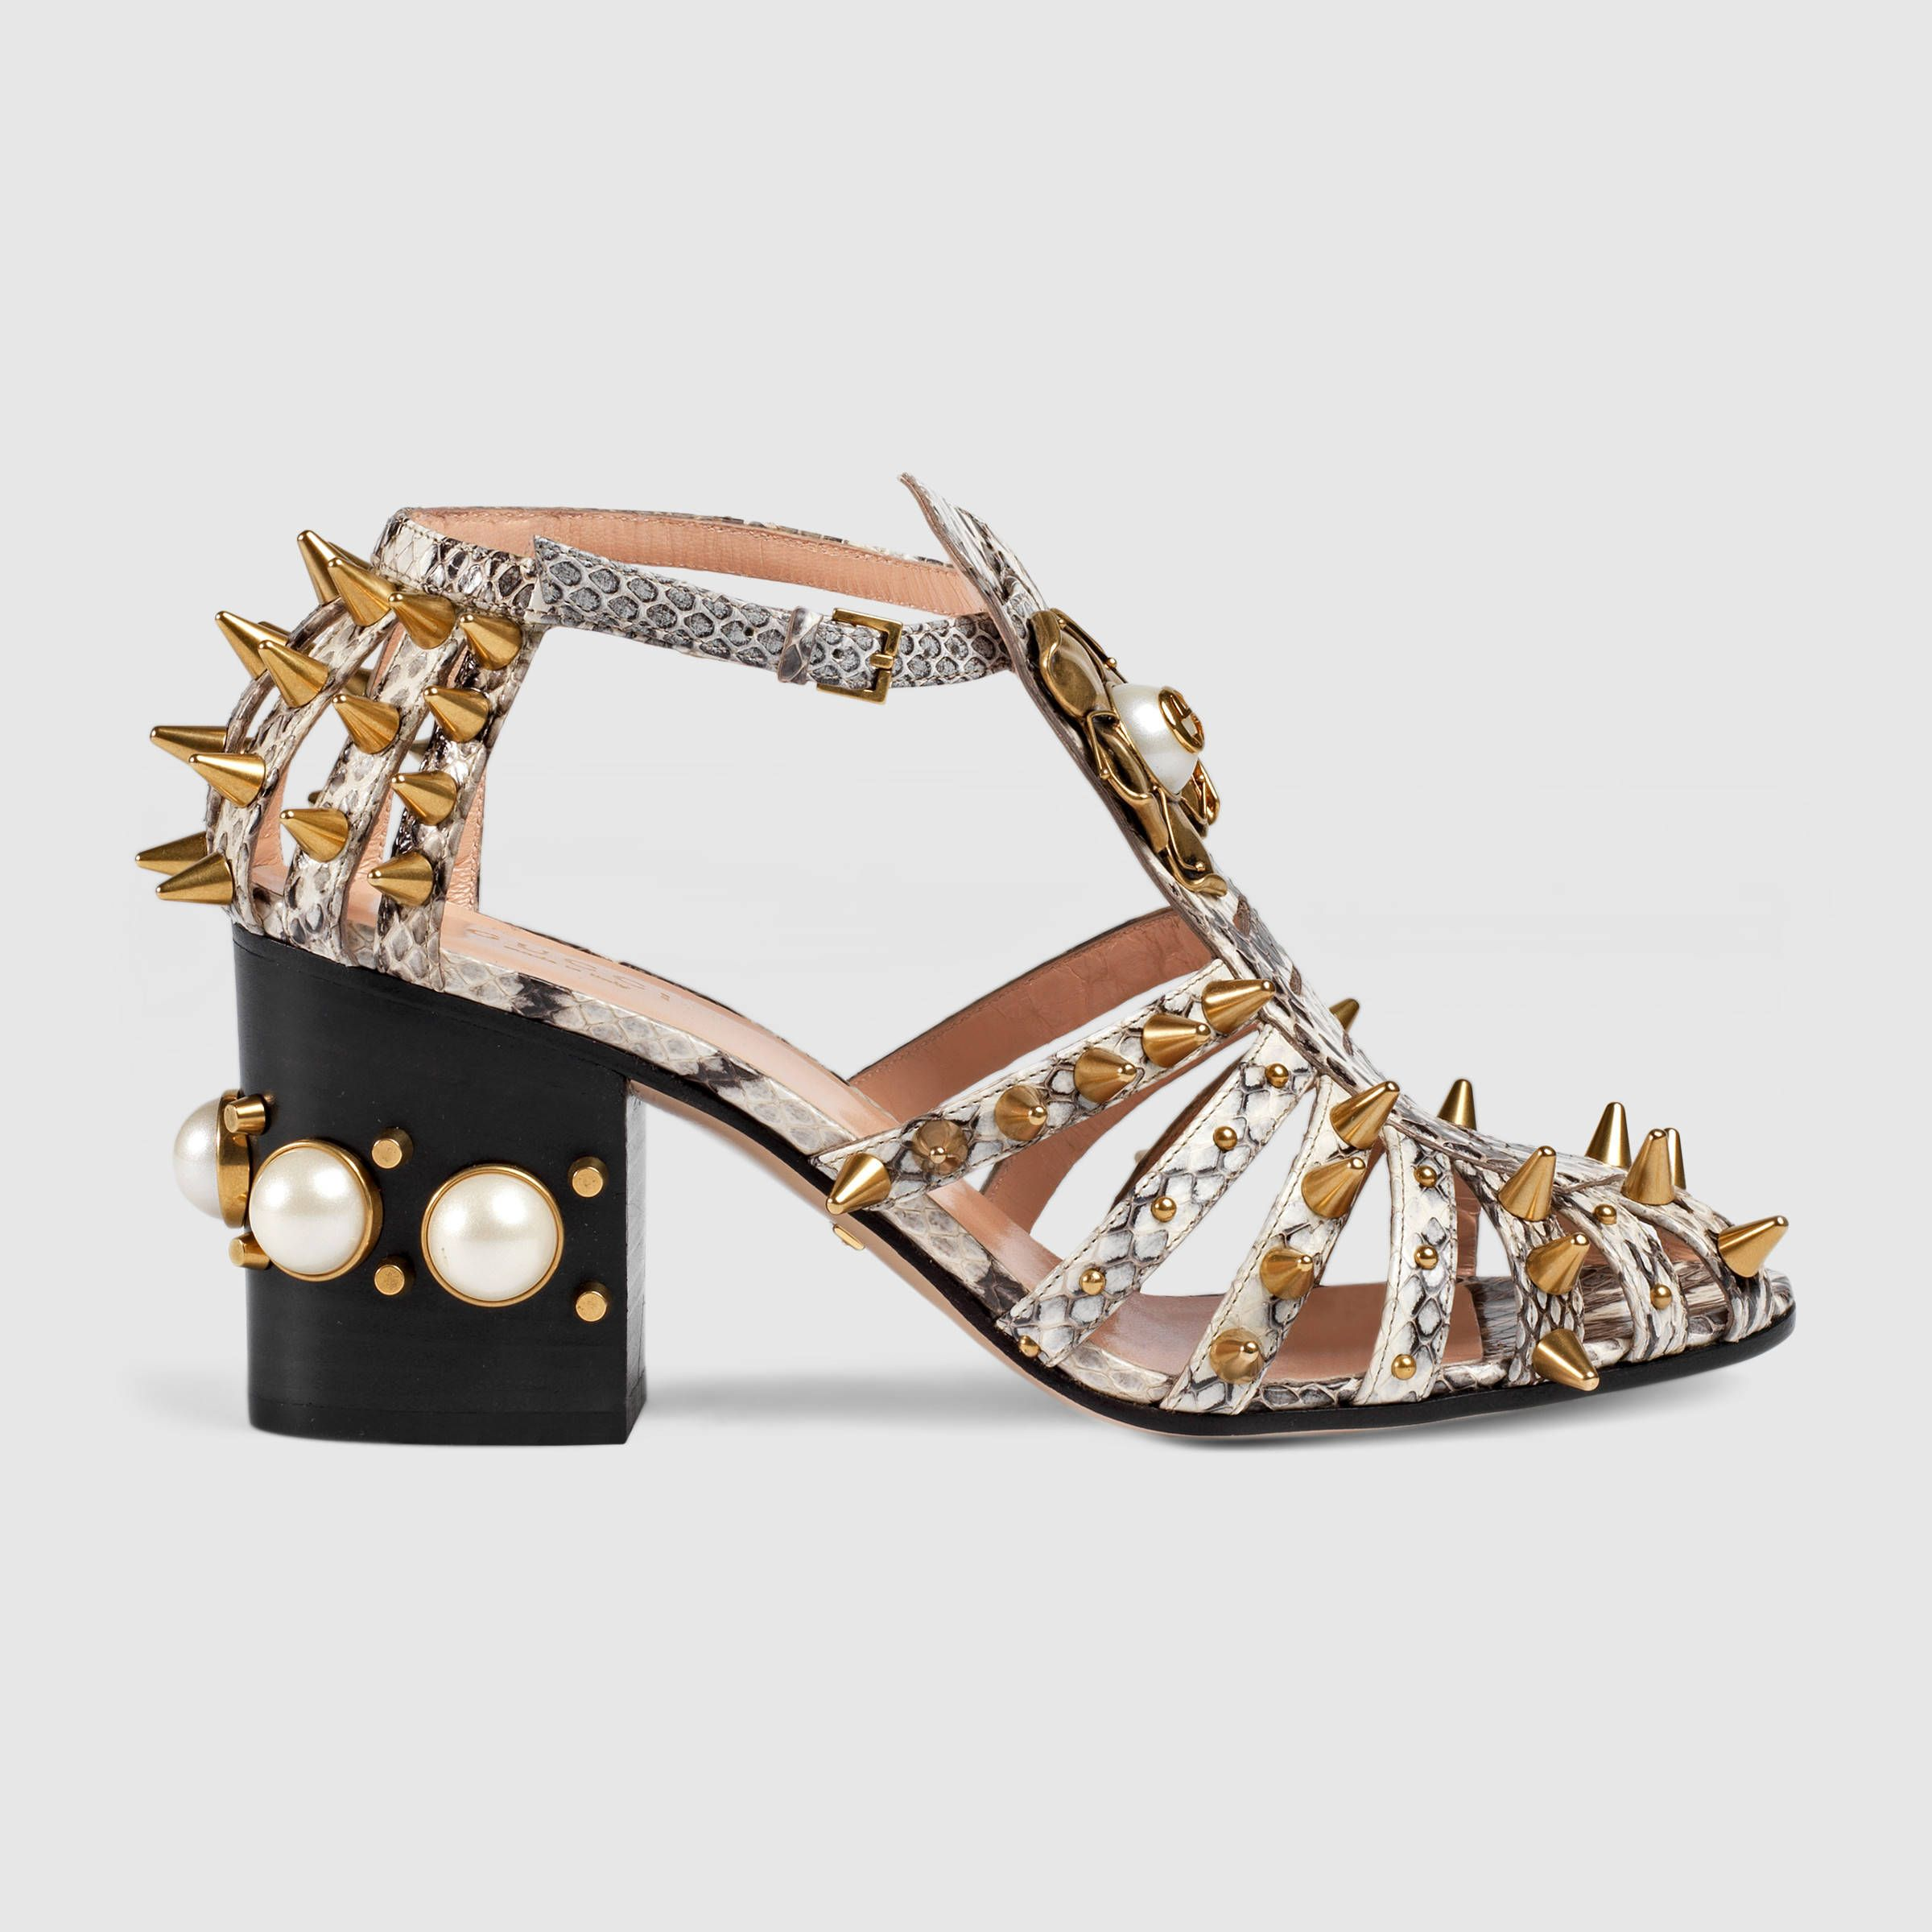 Womens sandals mid heel - Gucci Women Snake Mid Heel Studded Sandal 430436loo009535